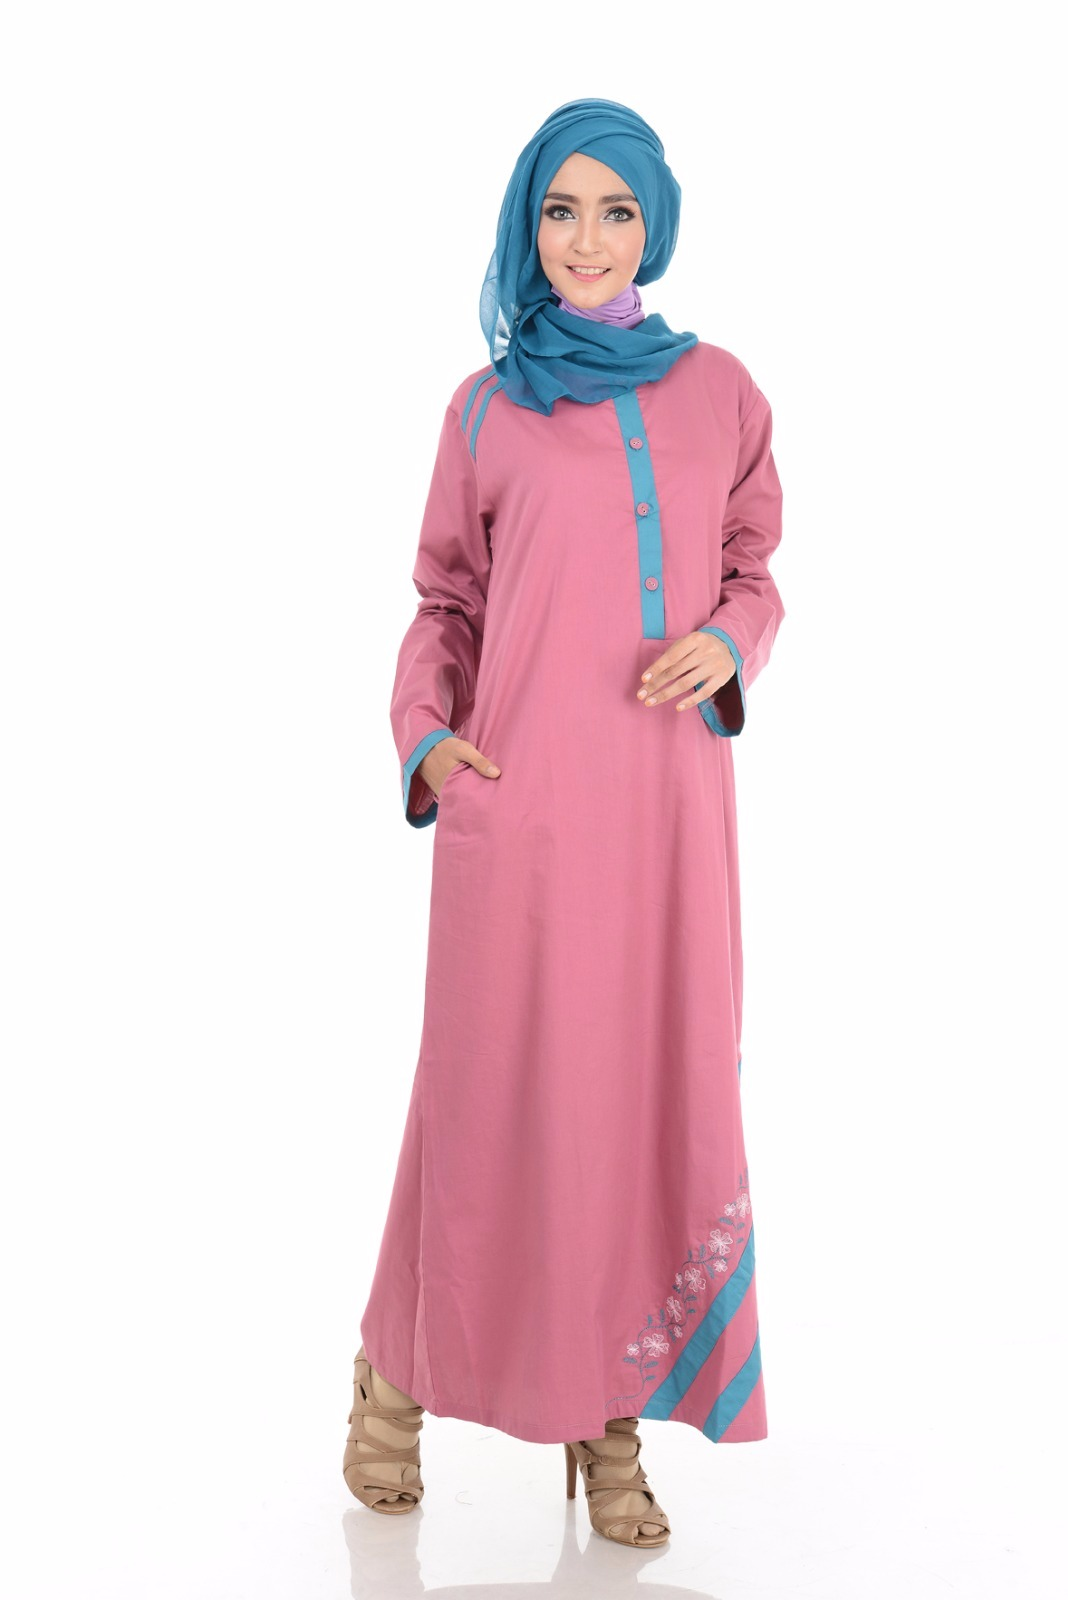 Jual Baju Gamis Muslim Nibras Fashion Collection Terbaru